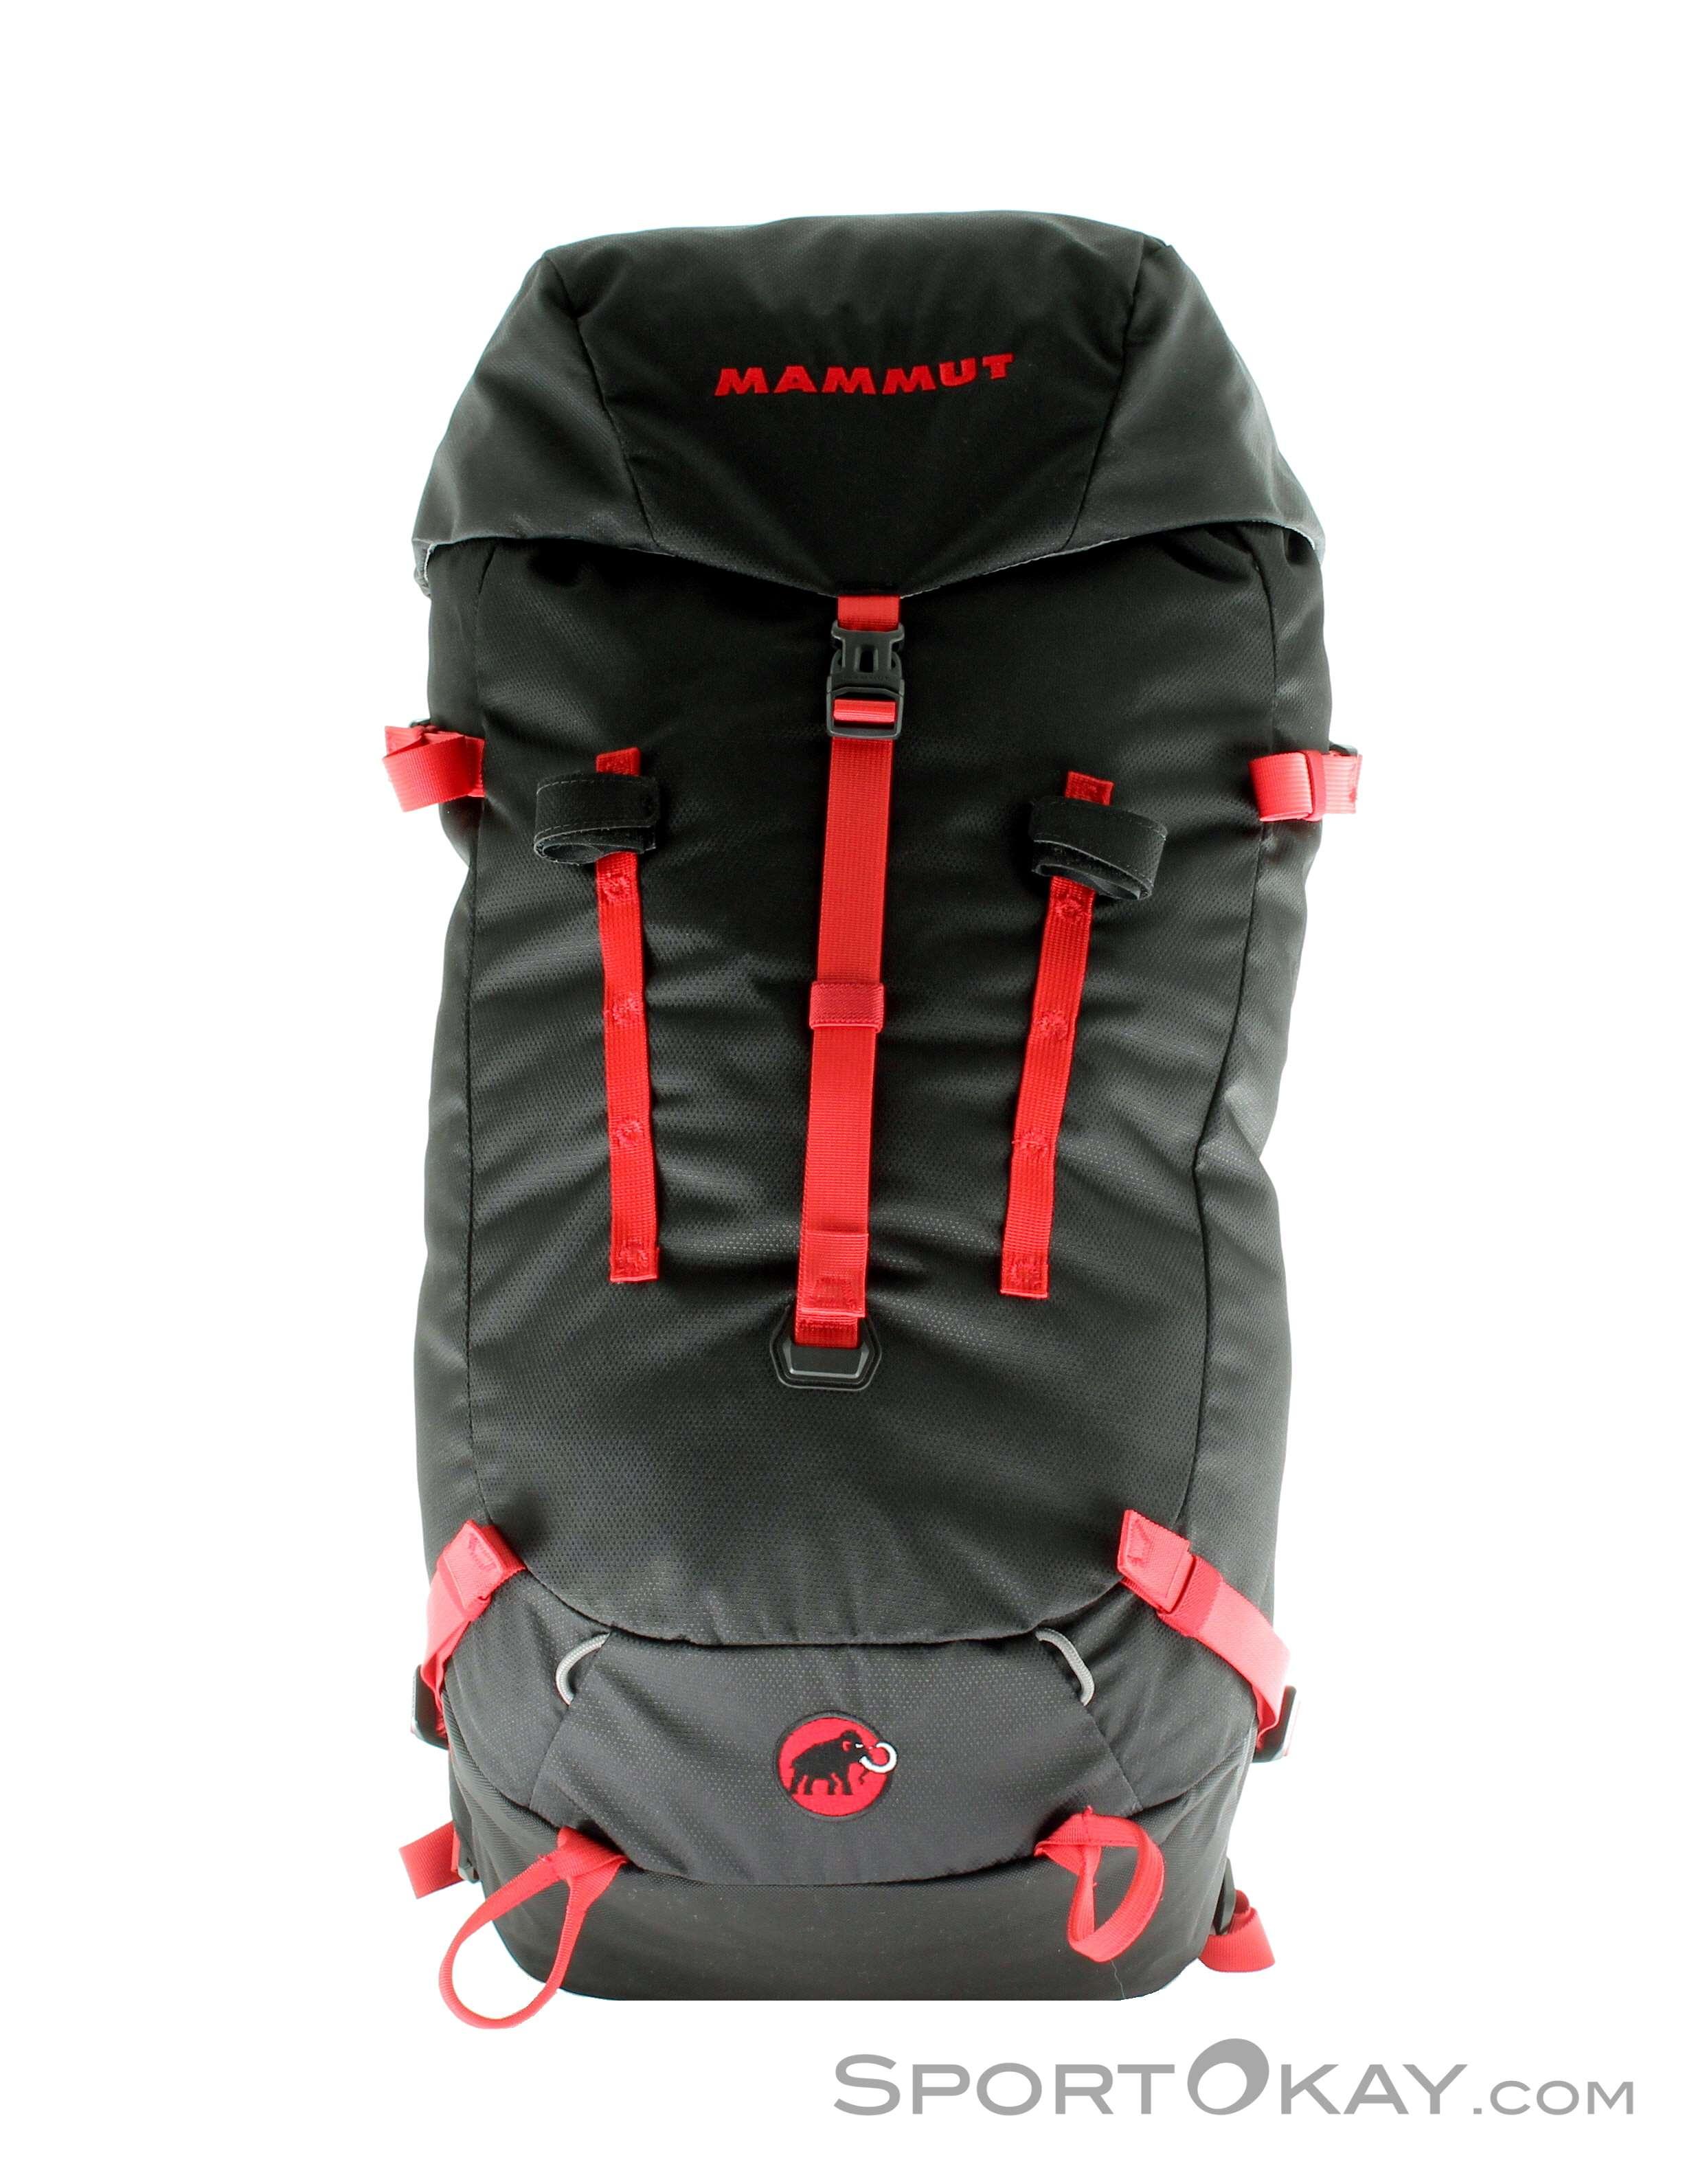 cad3a53093 Mammut Trion Tour 35+7l Backpack - Backpacks - Backpacks & Headlamps ...